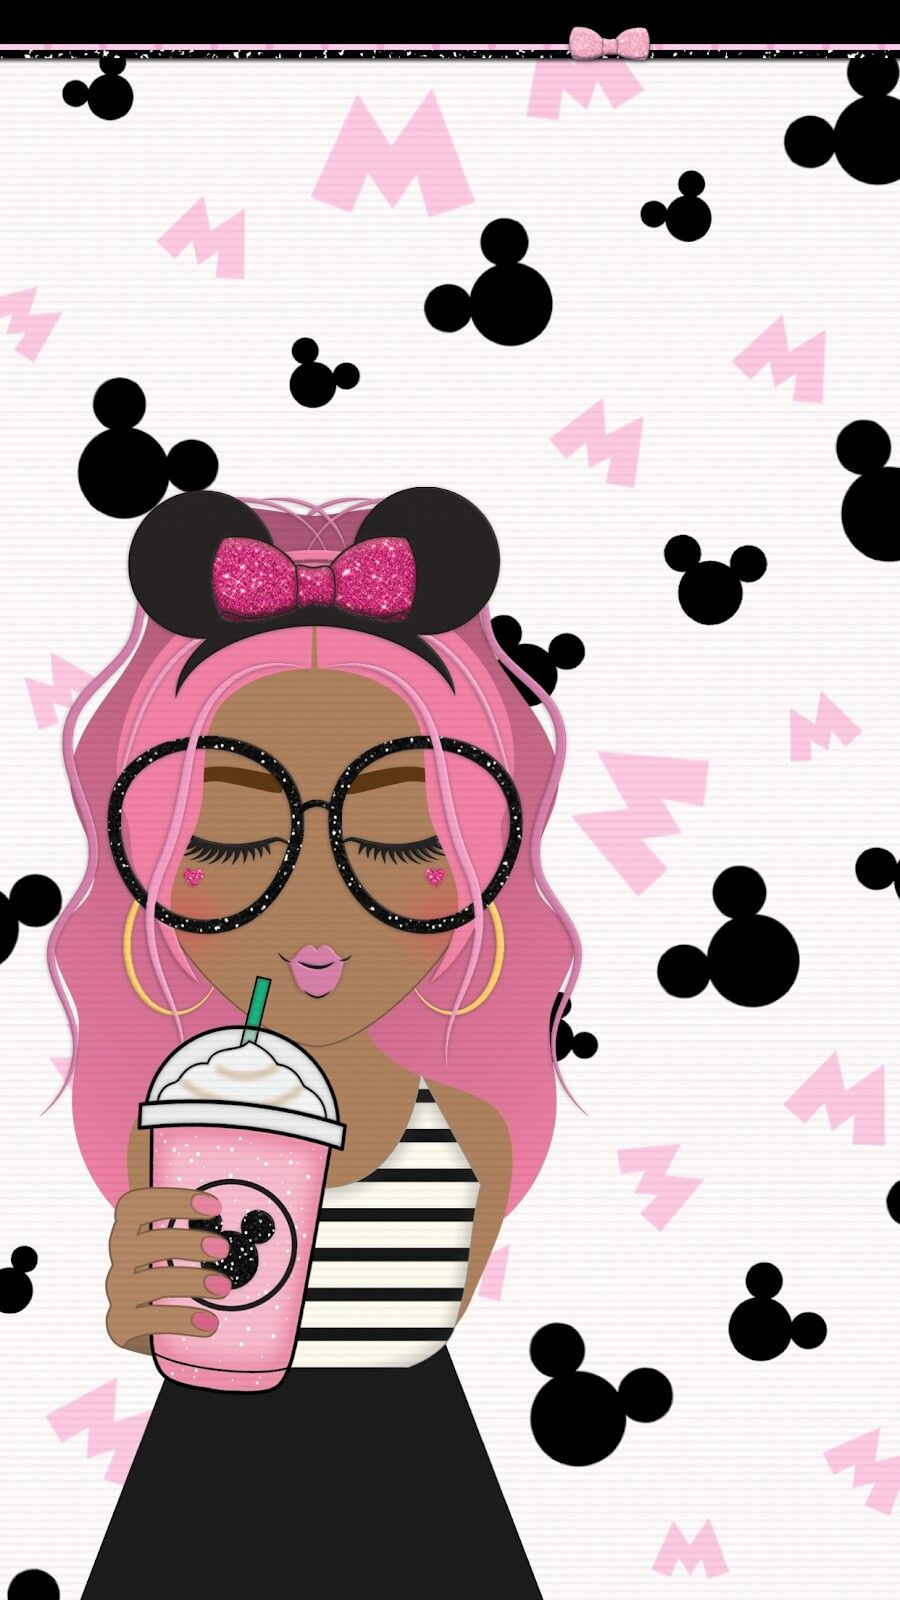 Tee S Iscreen Creations Cute Disney Wallpaper Cute Wallpapers Starbucks Wallpaper